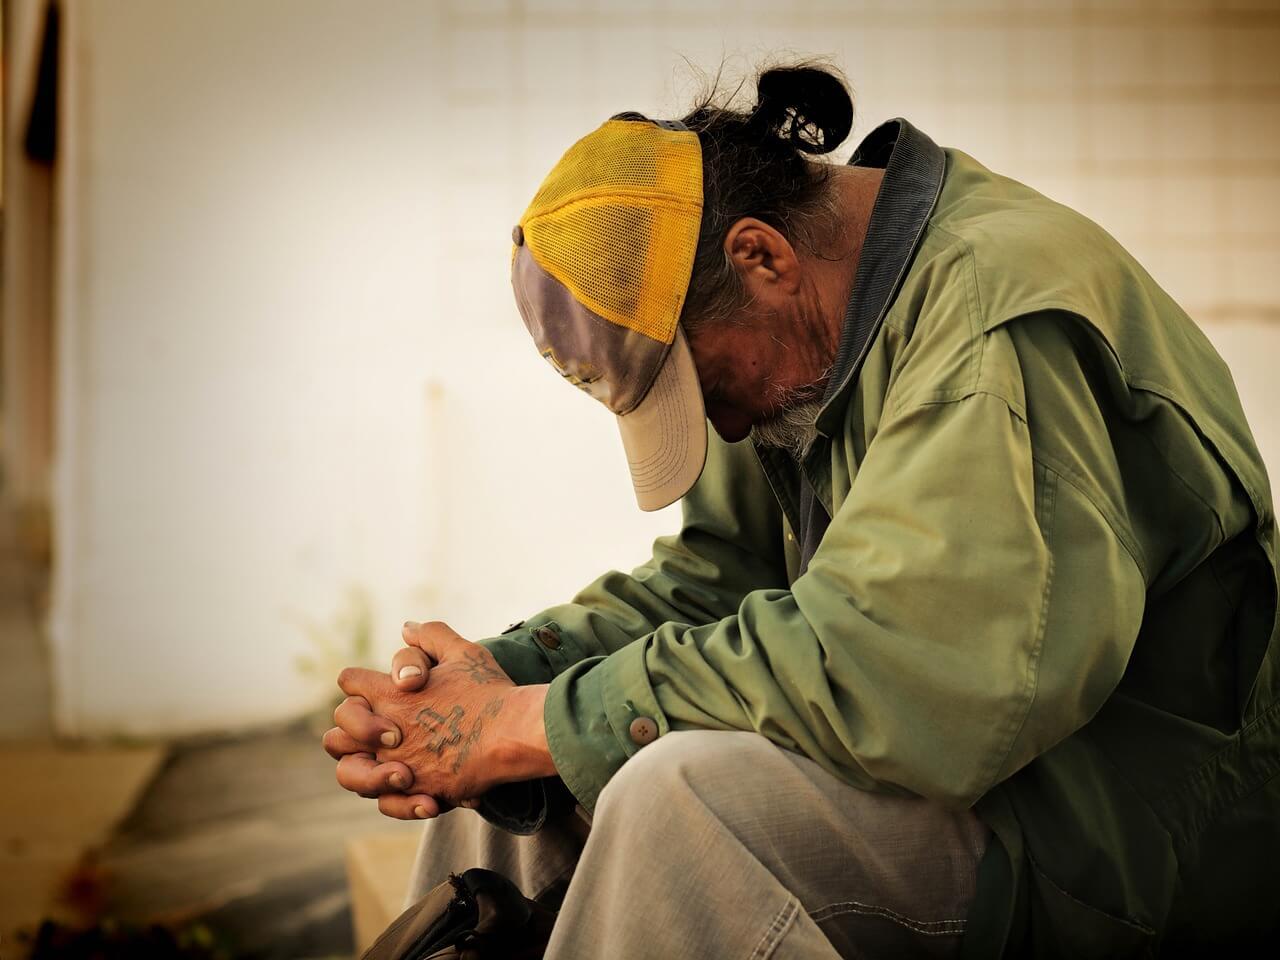 A homeless man sits on a roadside.